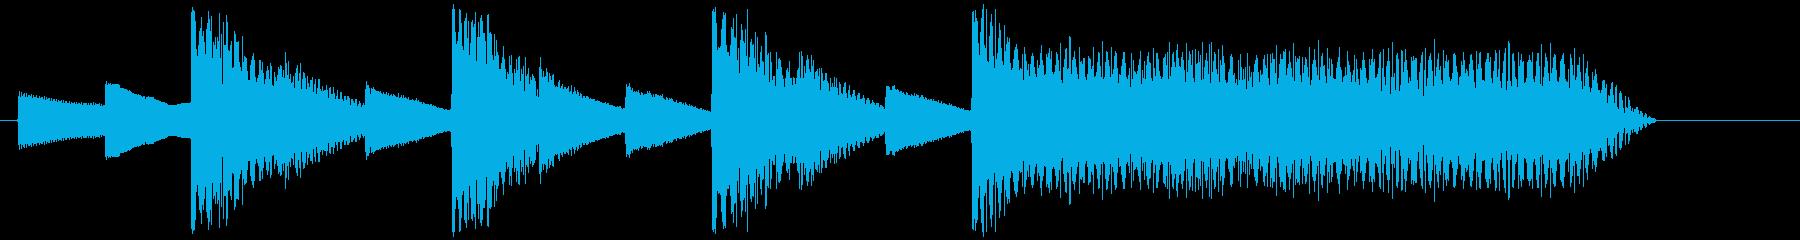 8bitジングル#2スタート&クリアの再生済みの波形